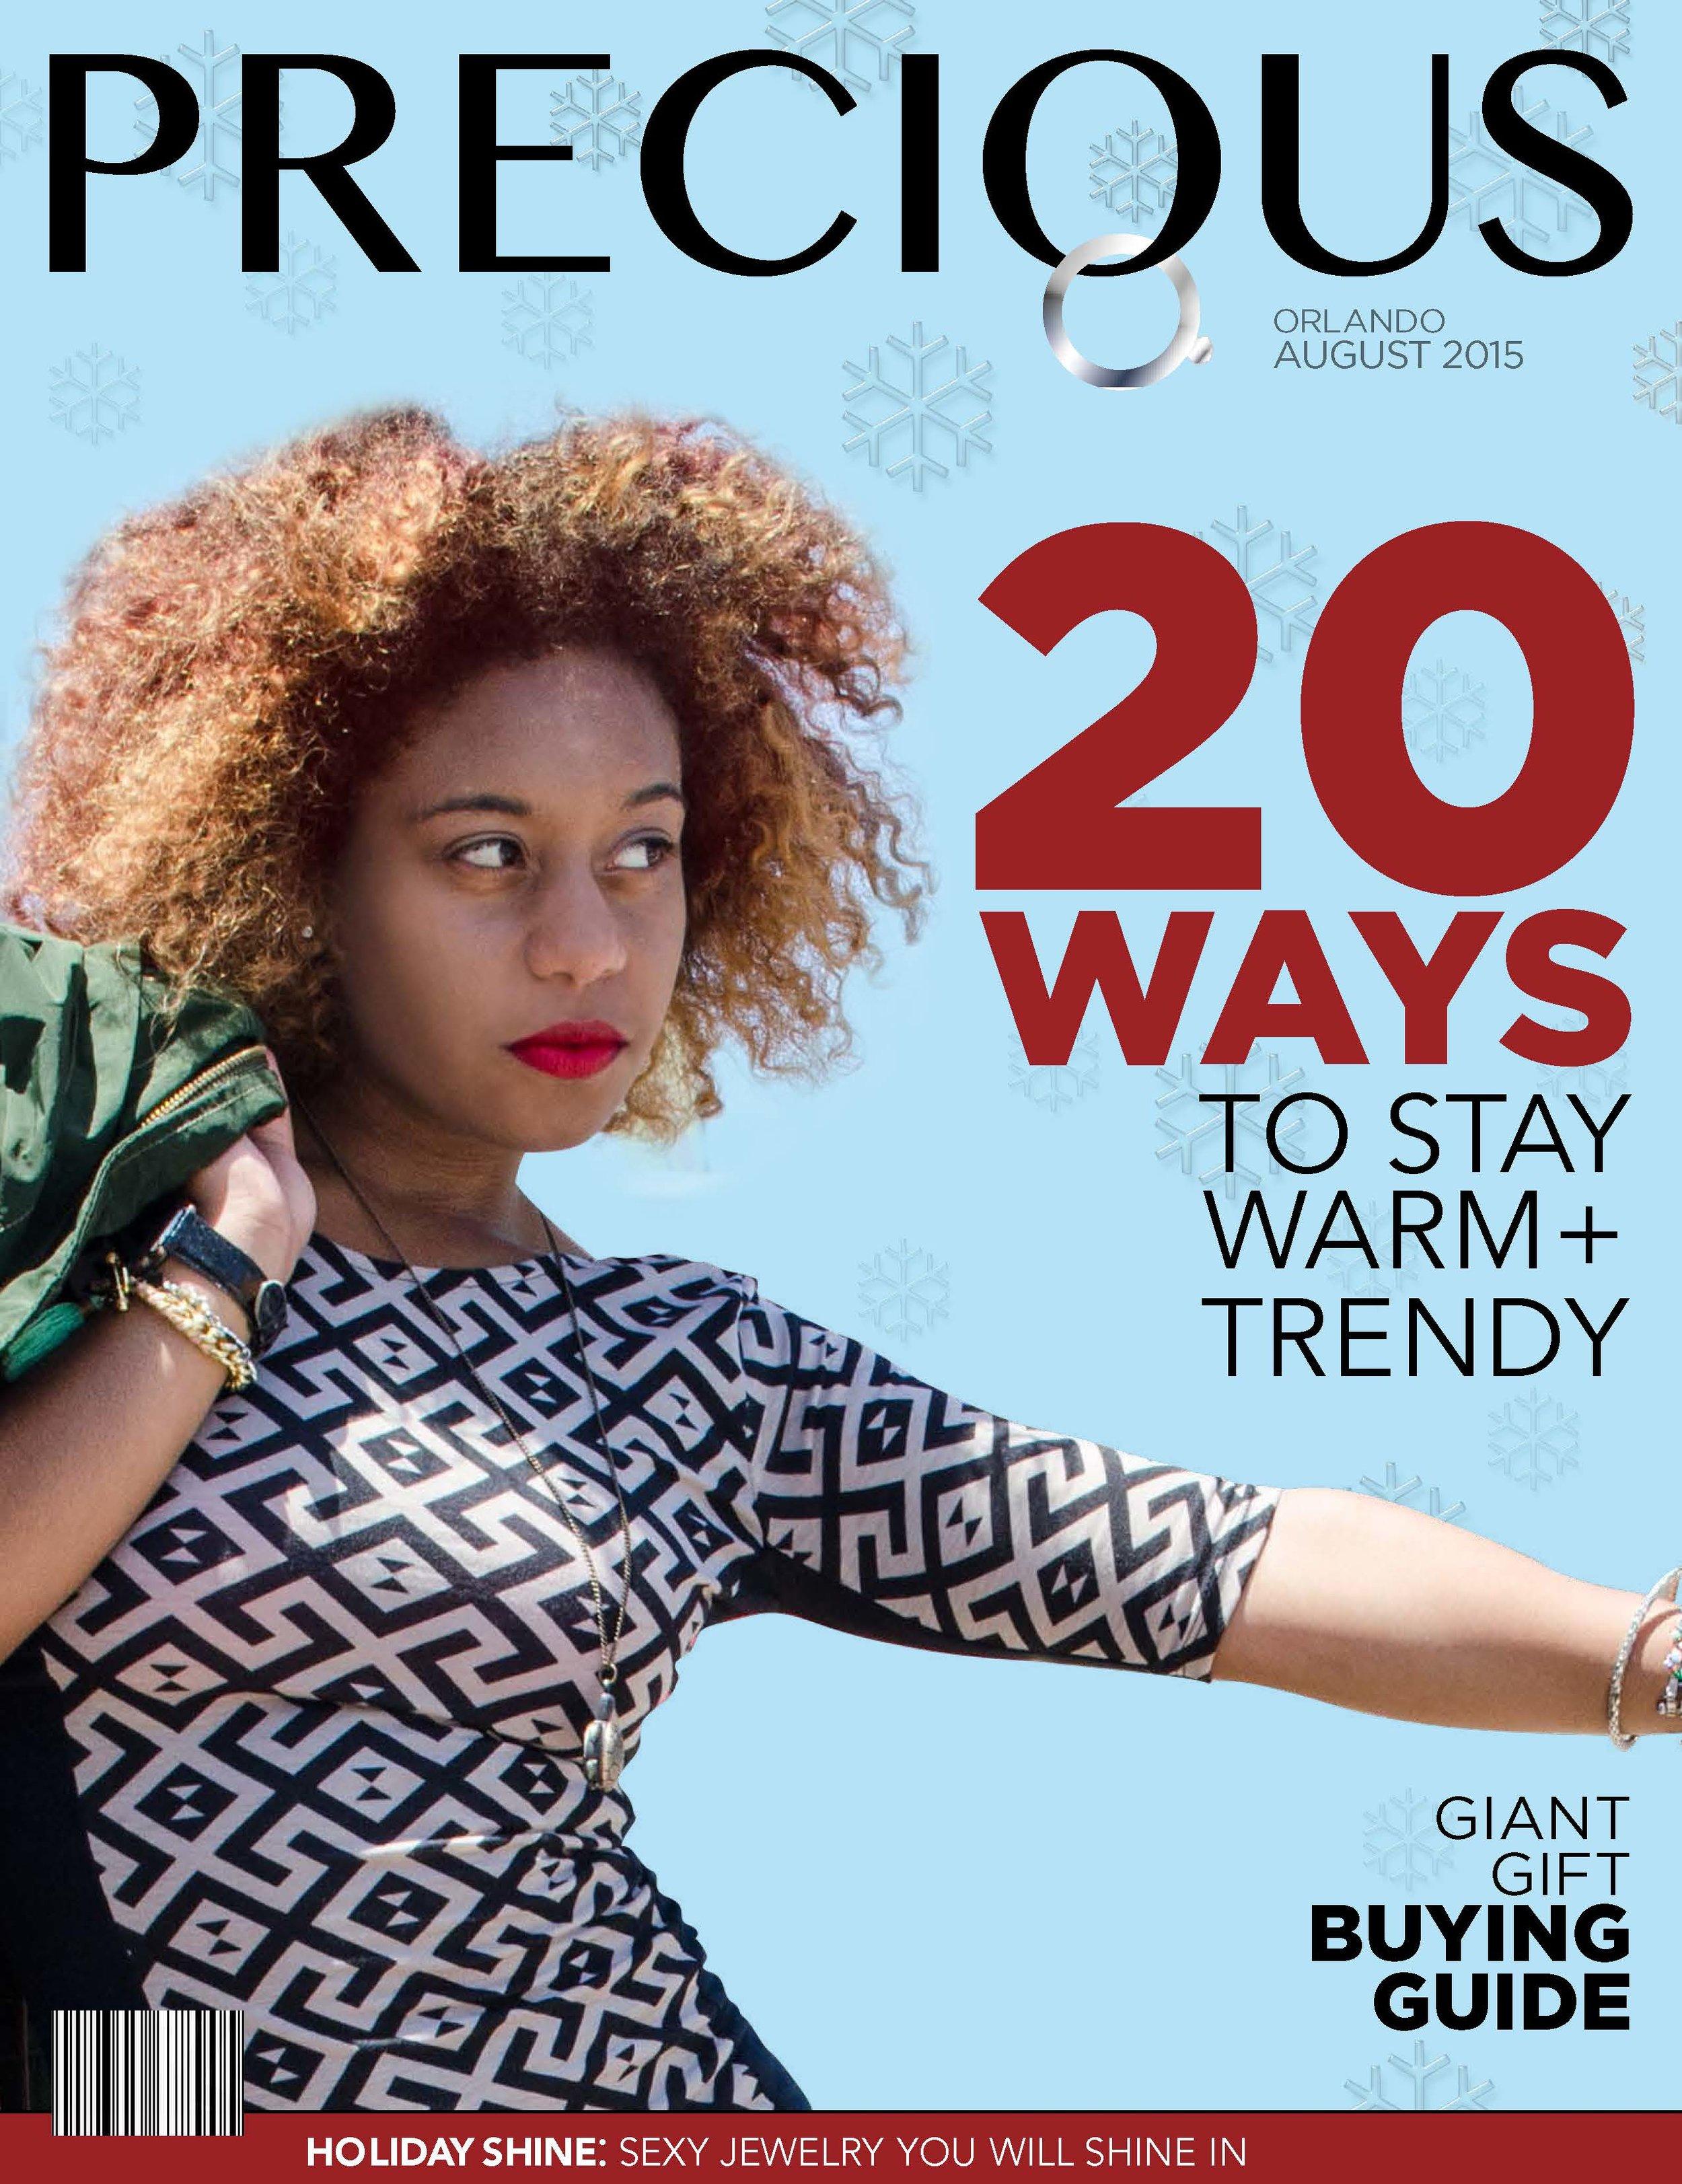 Camacho_Nallely__magazine_covers_899_Page_3.jpg